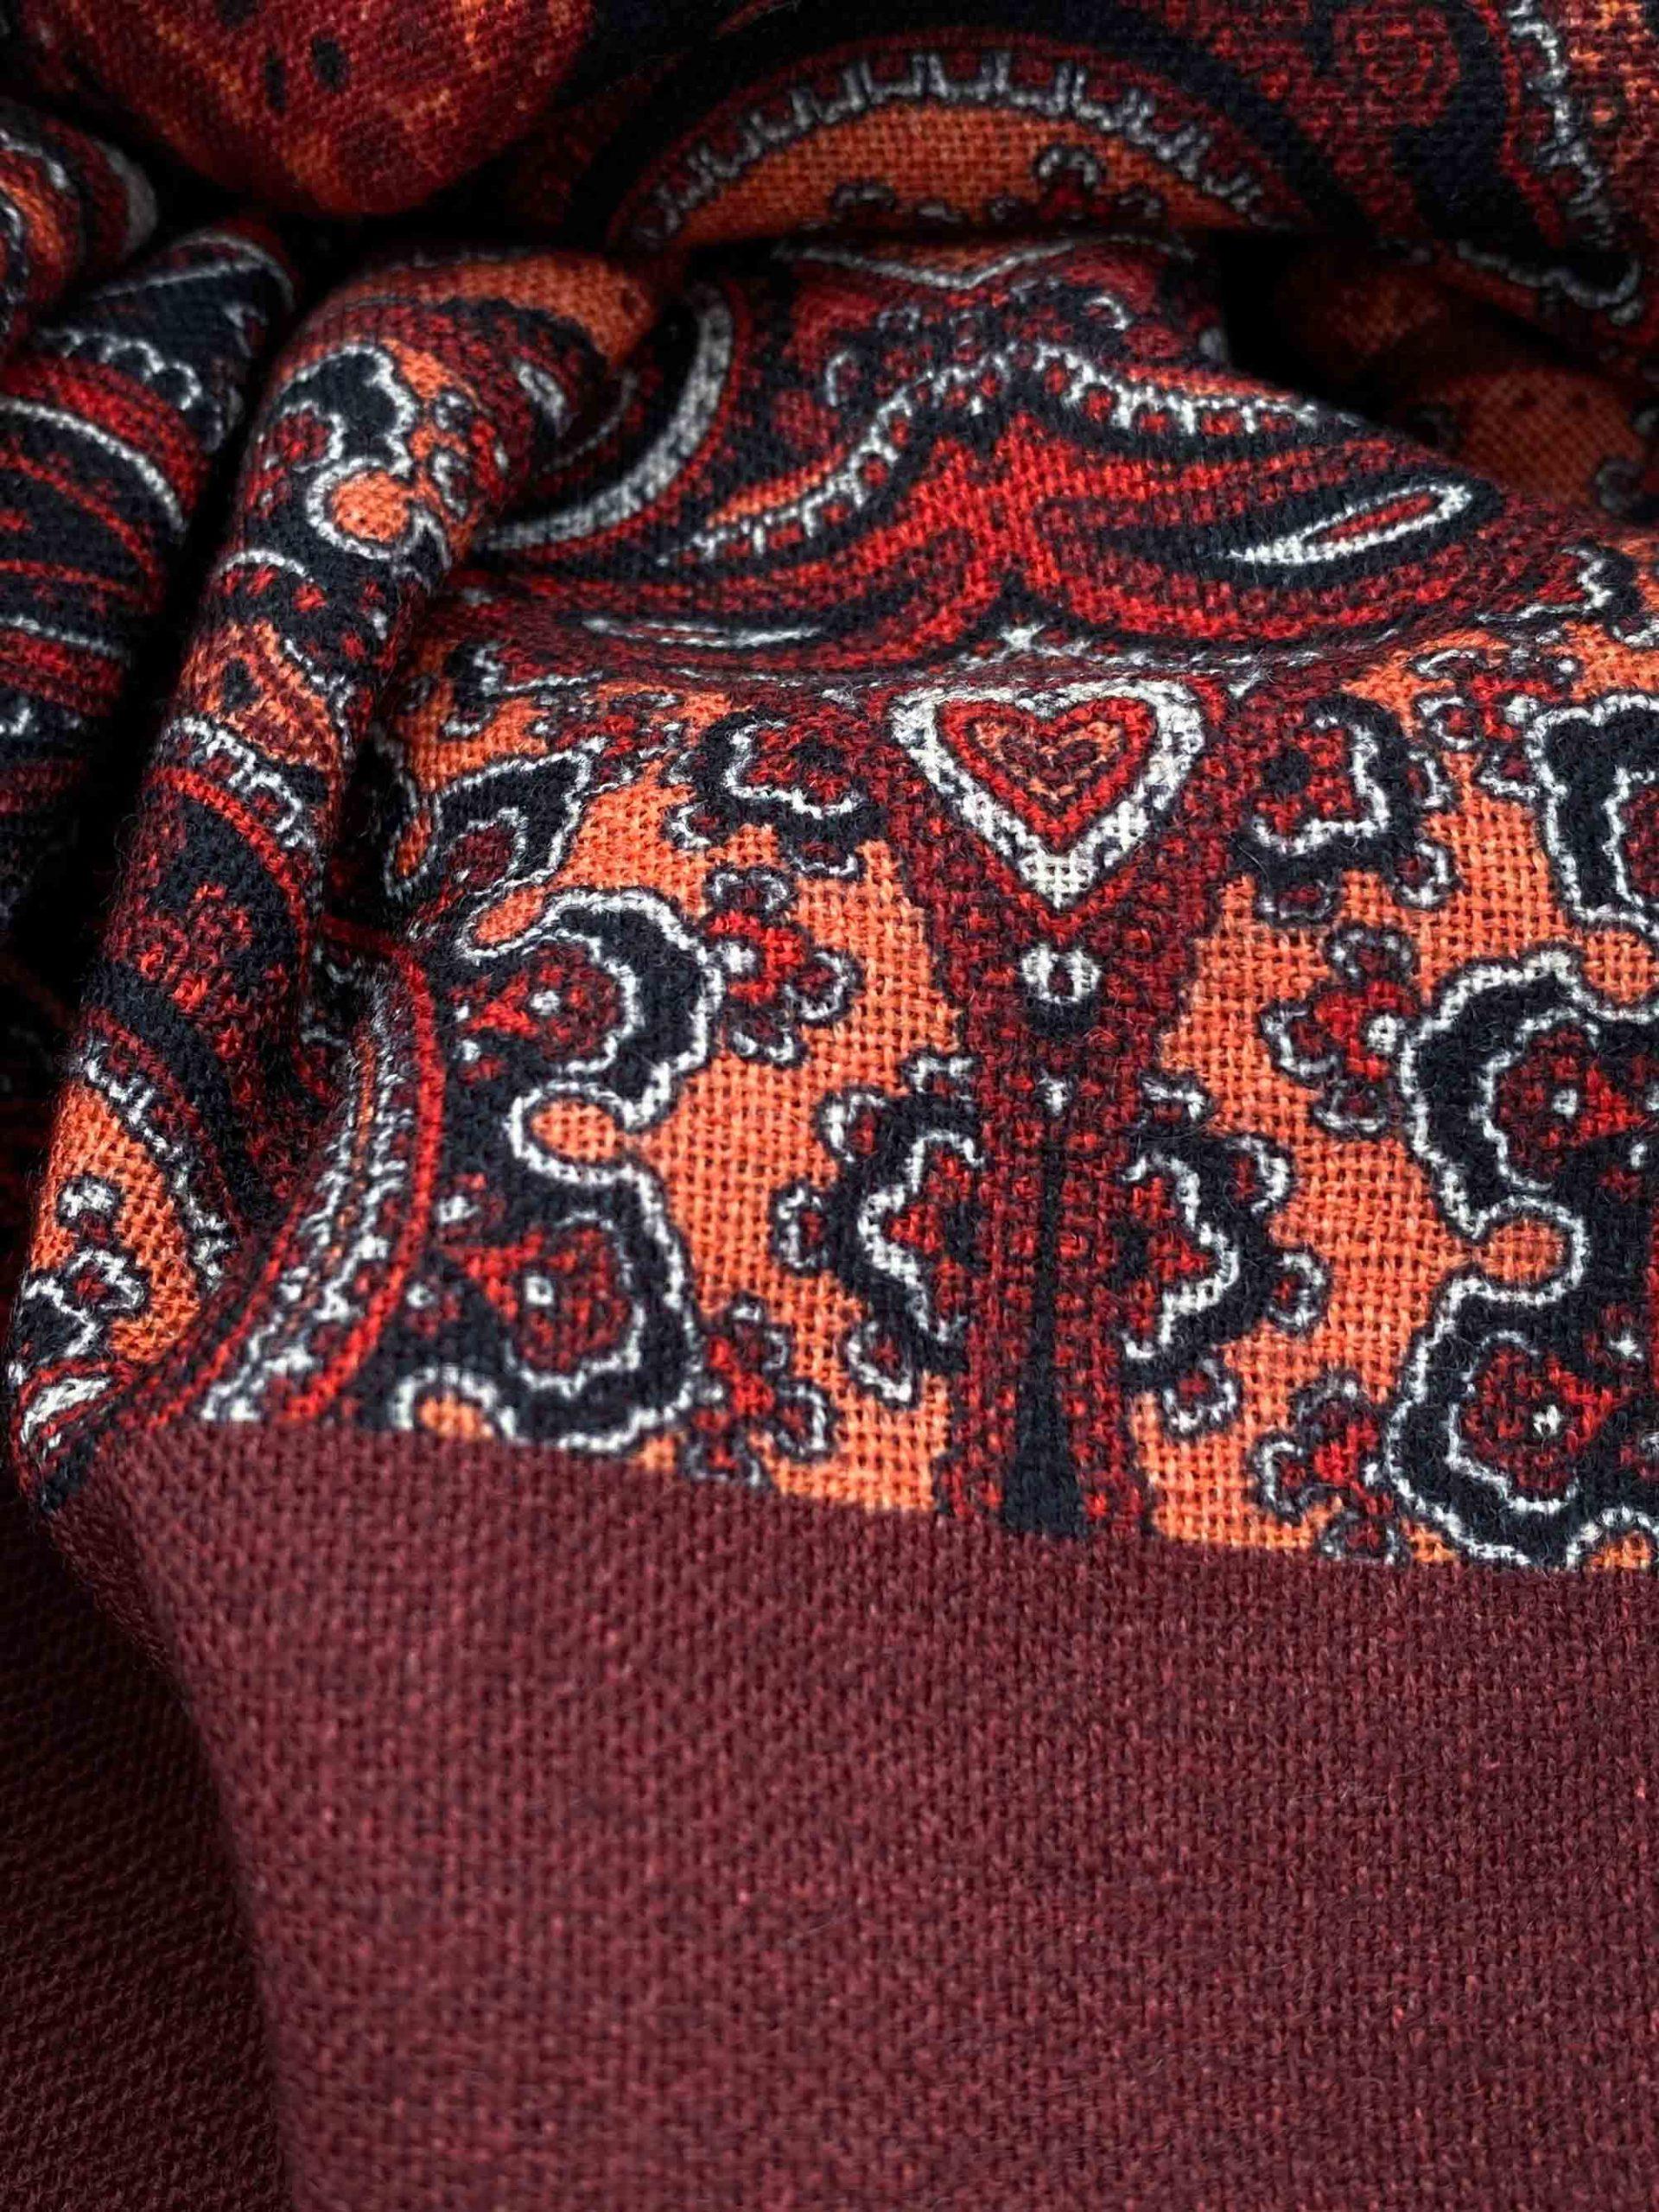 pashmina buona fortuna exclusivas comprar online moda italiana foulards shop cashmeres tejas naranjas